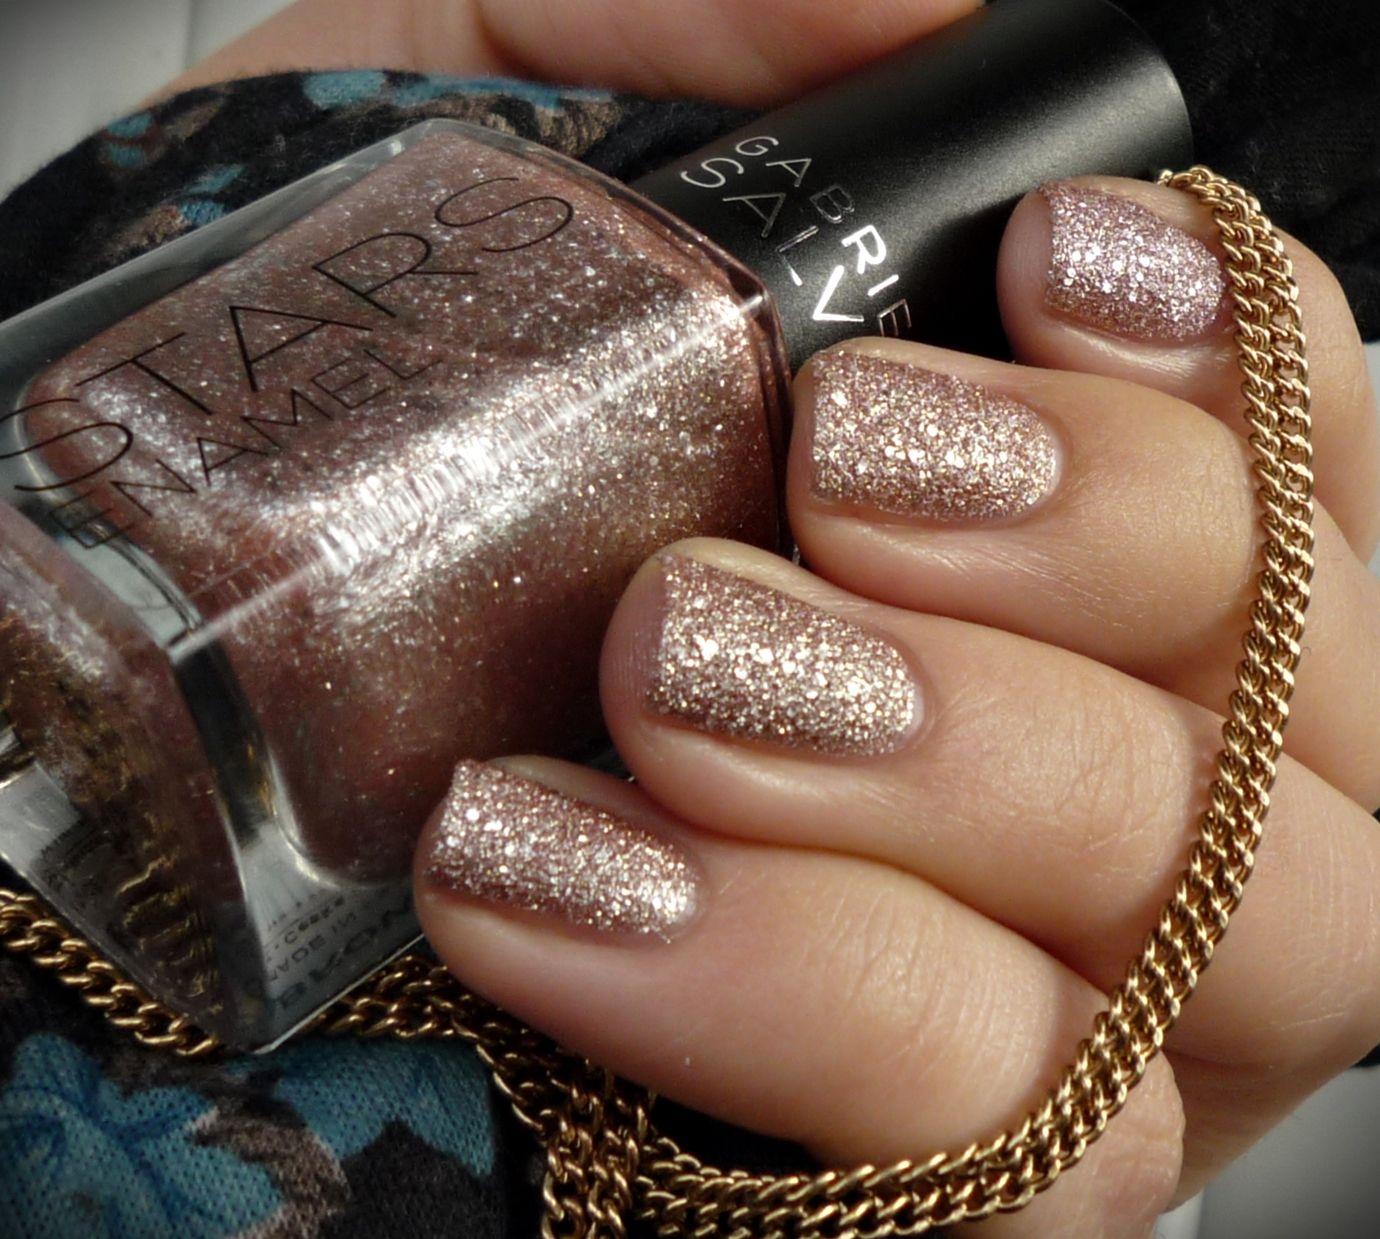 Gabriella Salvete Stars Enamel Blu Imperiale Lavender Love Natale Flower Brown Sugar